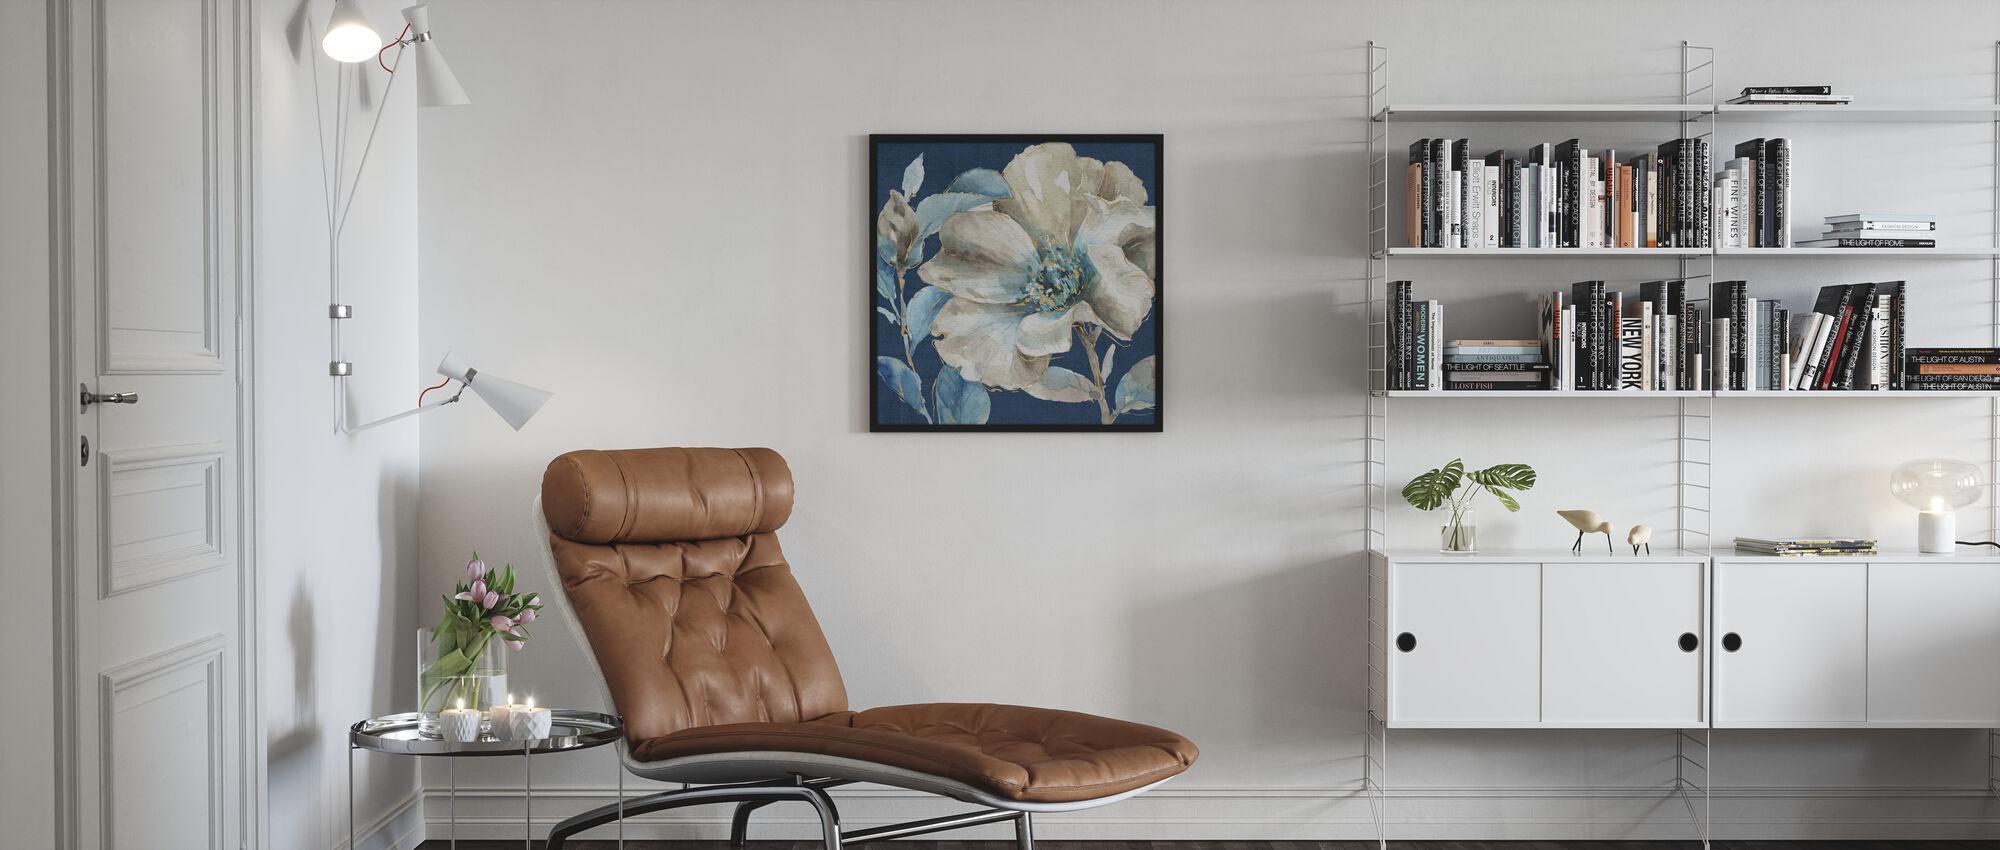 Indigold IV Navy - Poster - Living Room